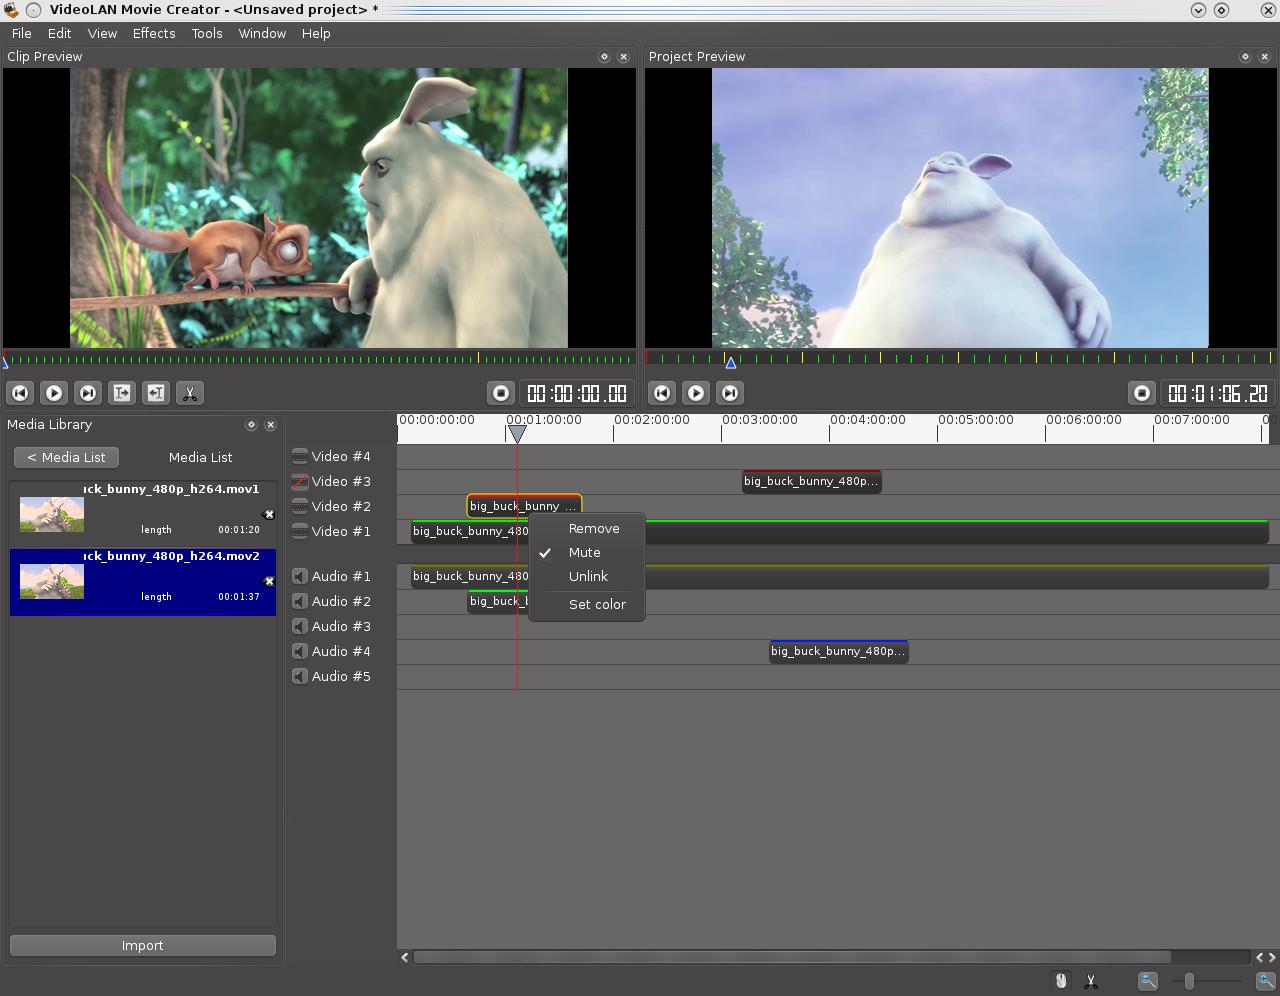 windows movie maker file types - VideoLAN Movie Creator